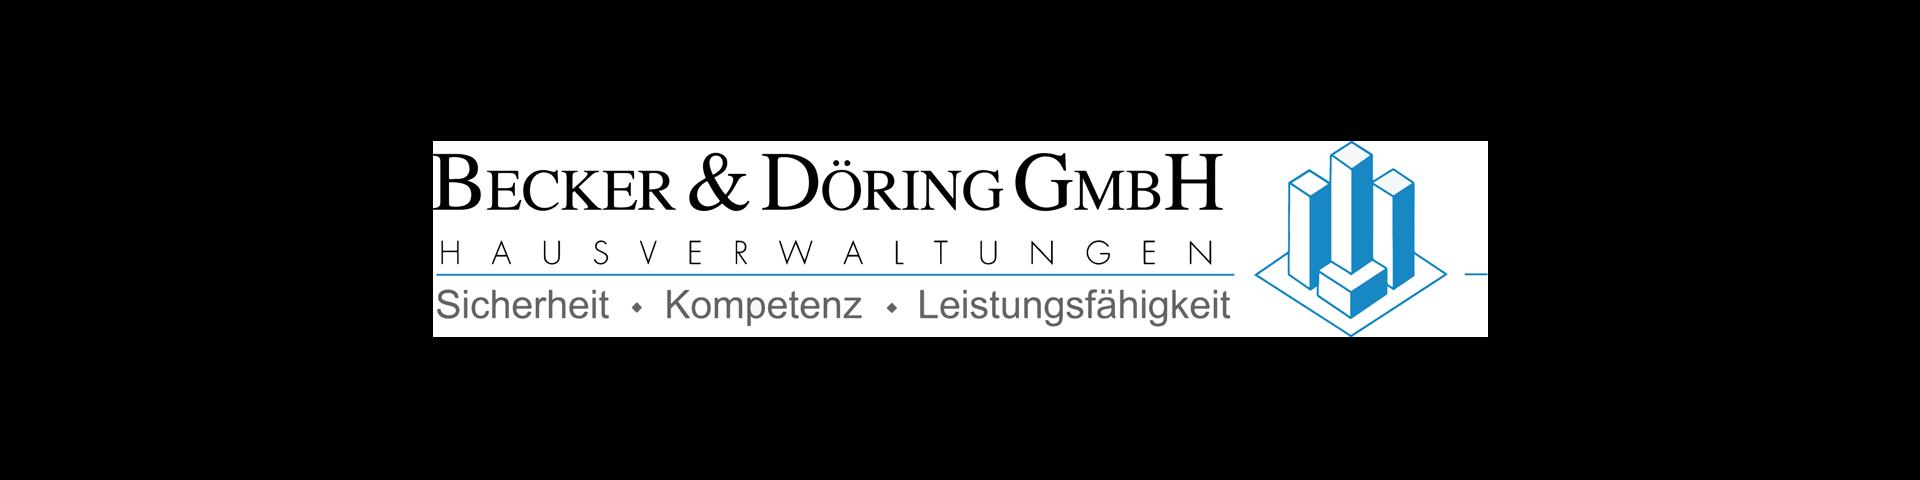 Header Becker & Döring GmbH